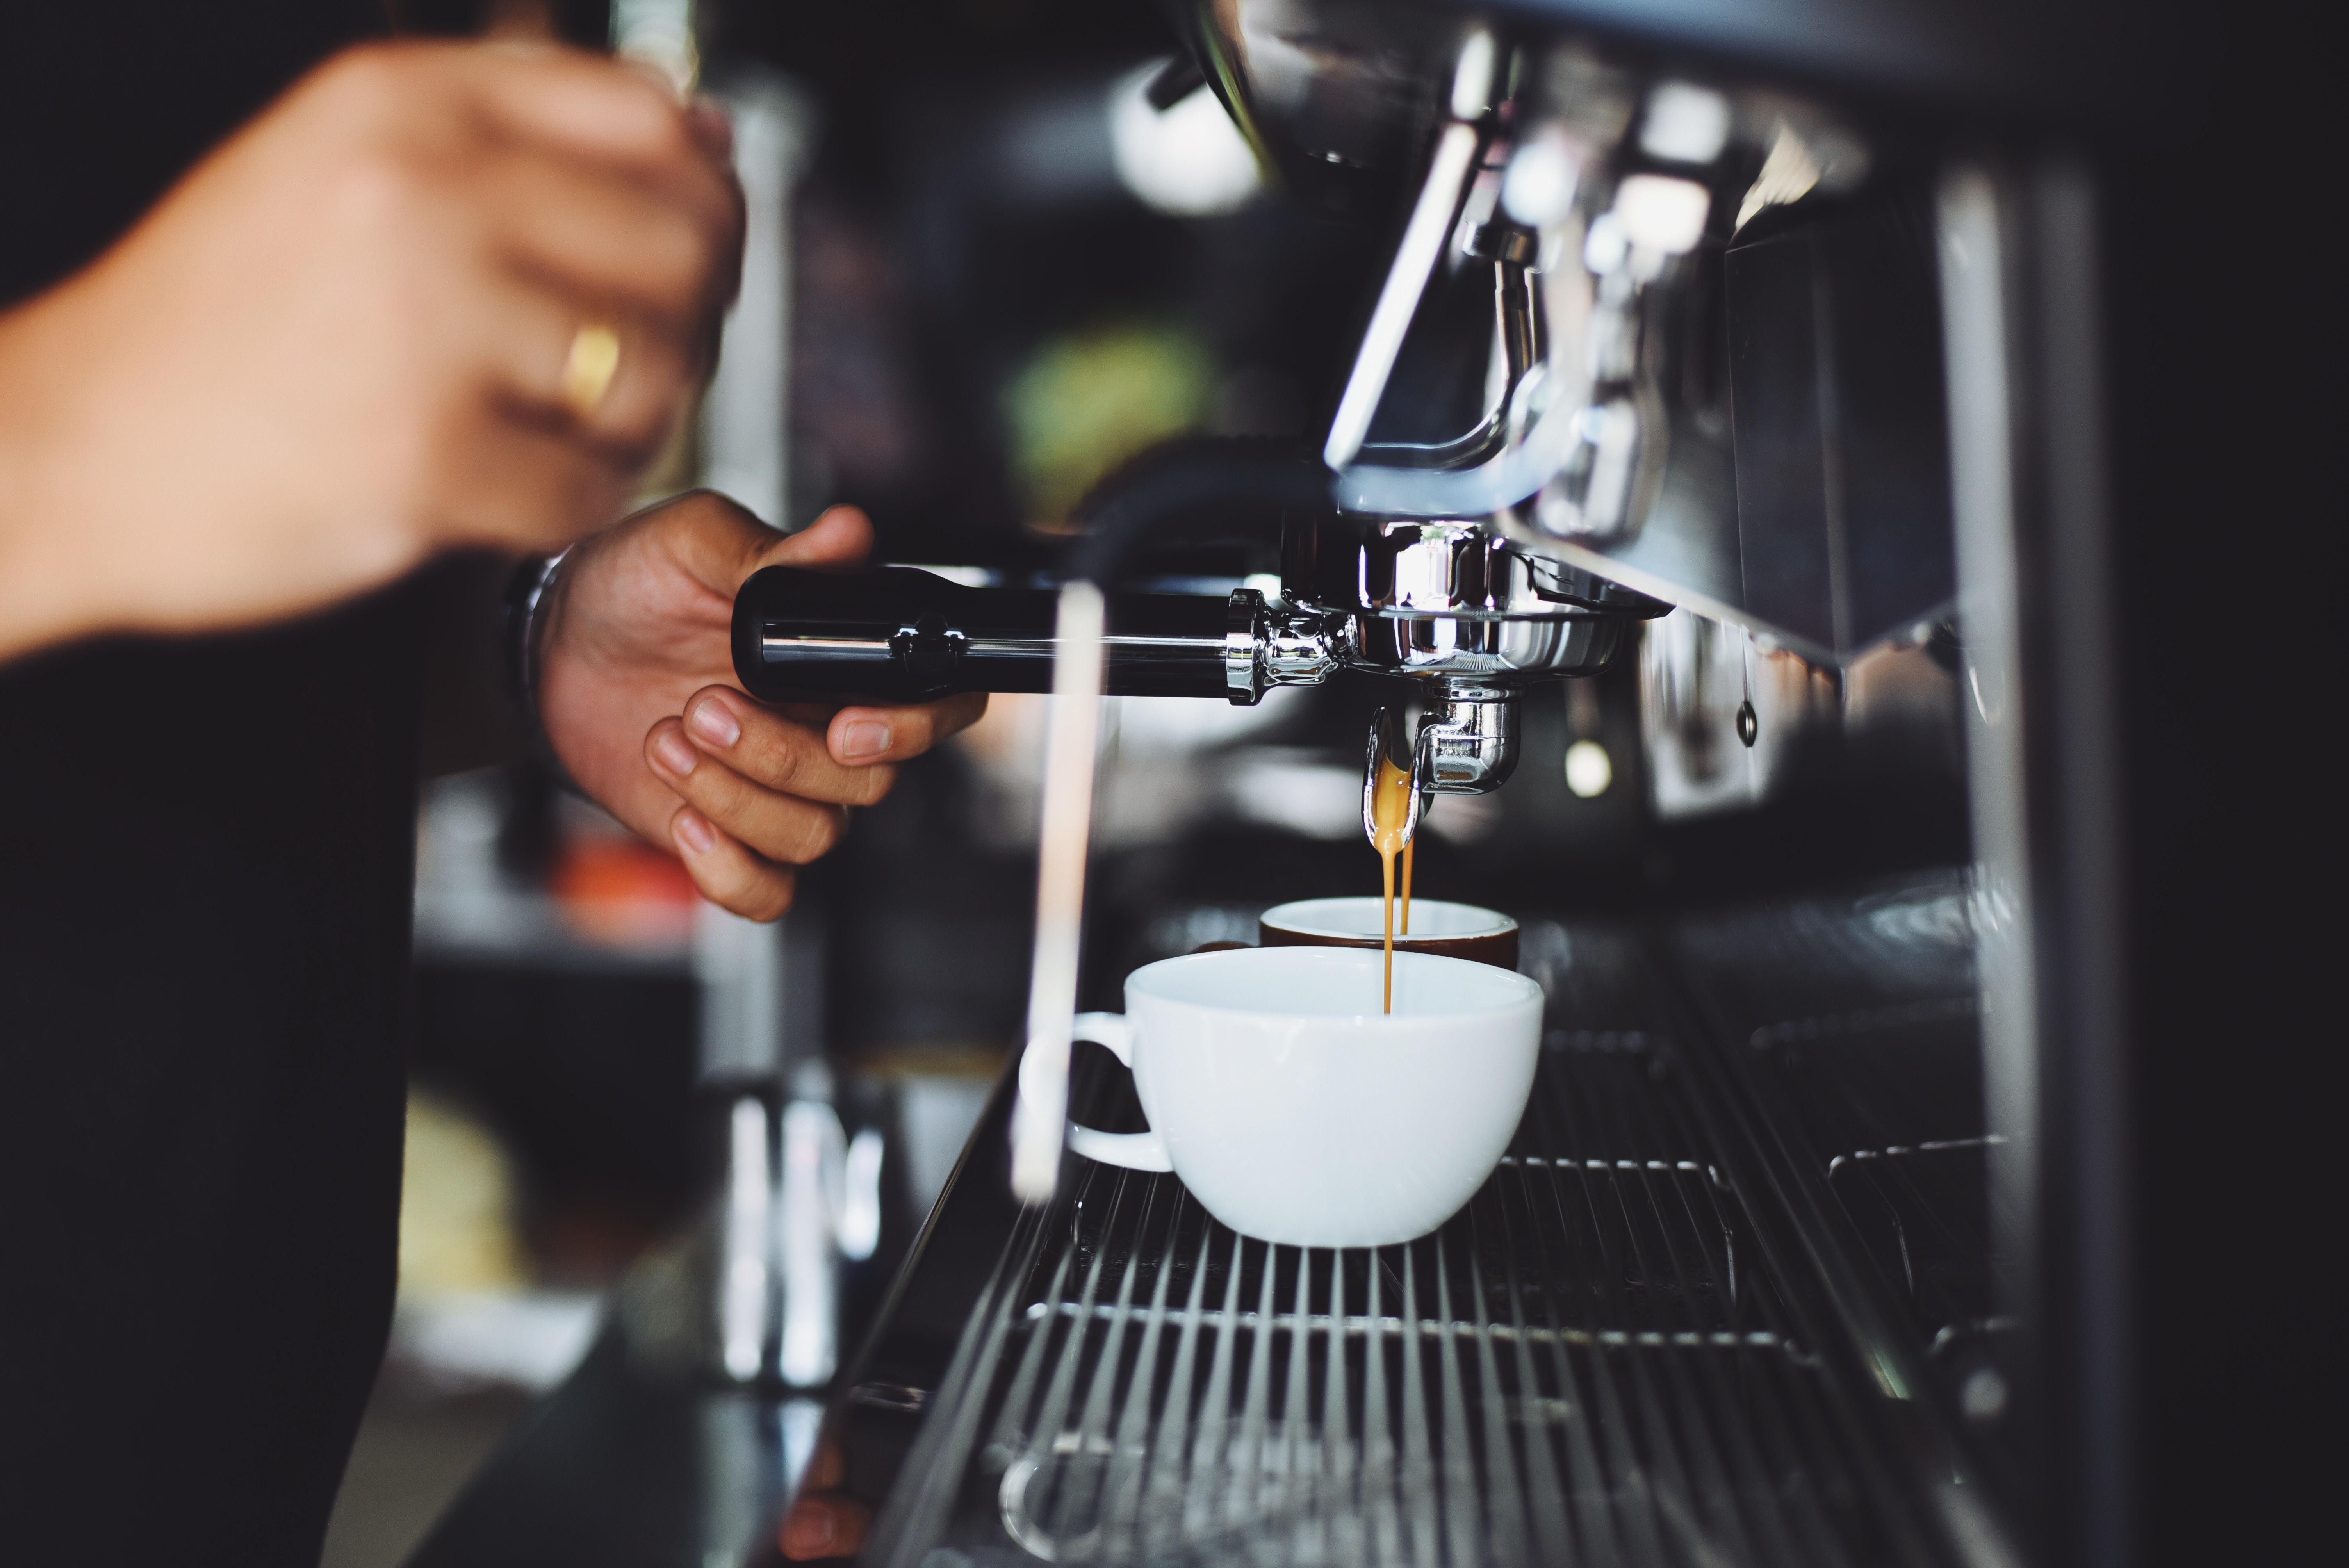 Professional Coffee Machine Restaurant 183 Free Stock Photo